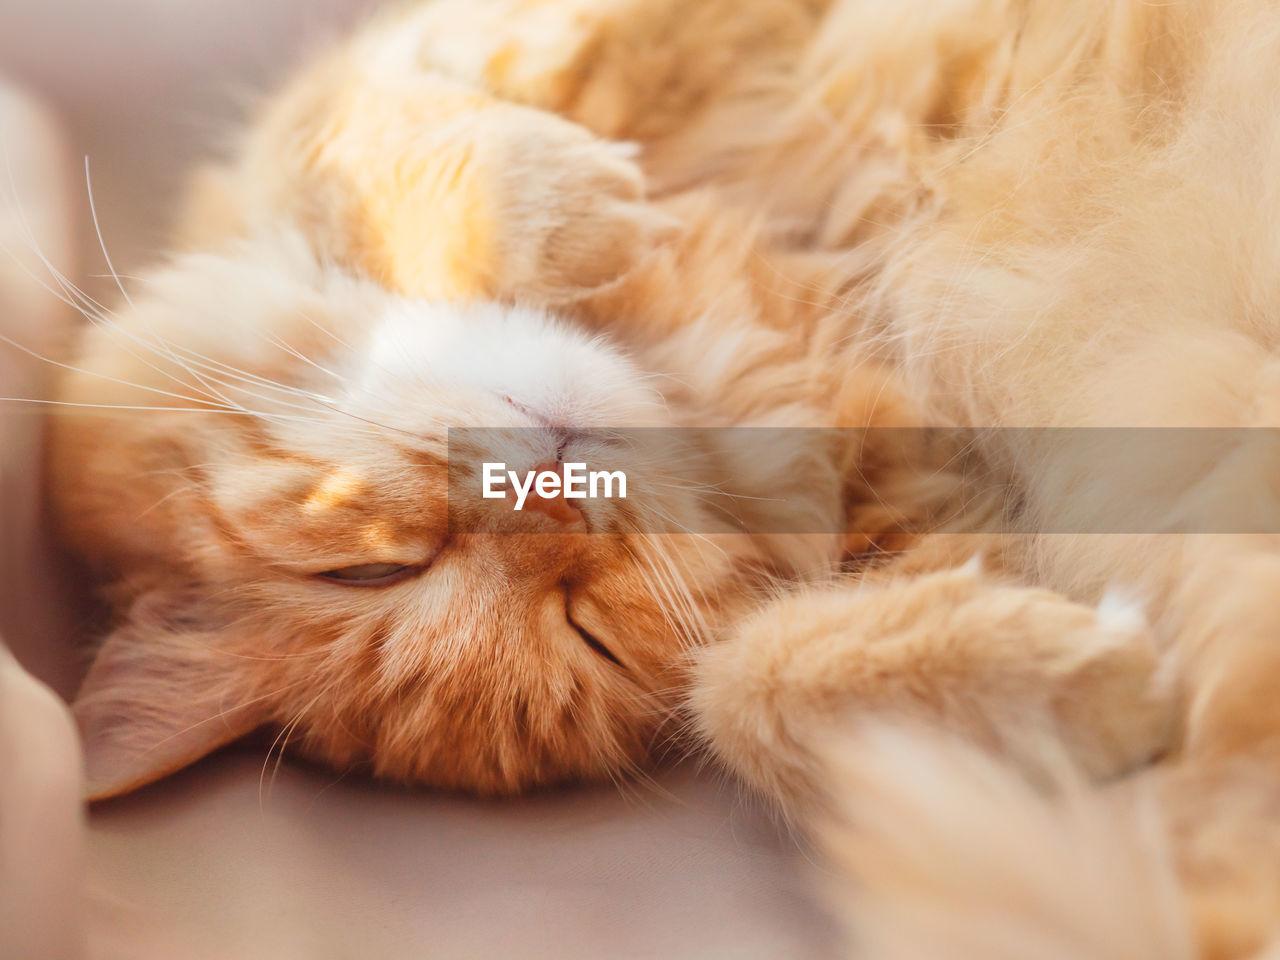 CLOSE-UP OF SLEEPING CAT